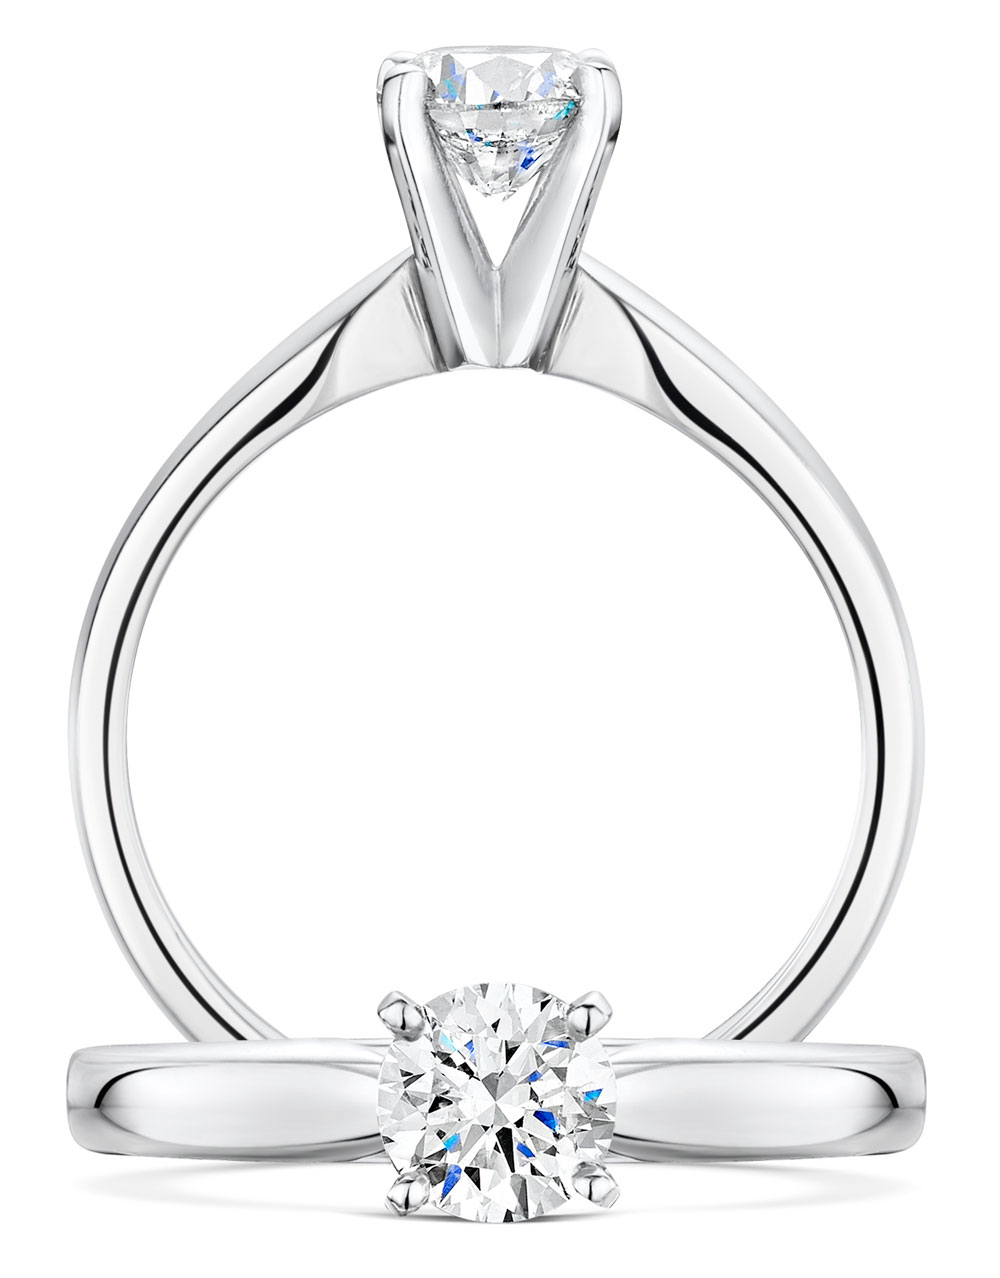 Classic Brilliant Cut Diamond Ring